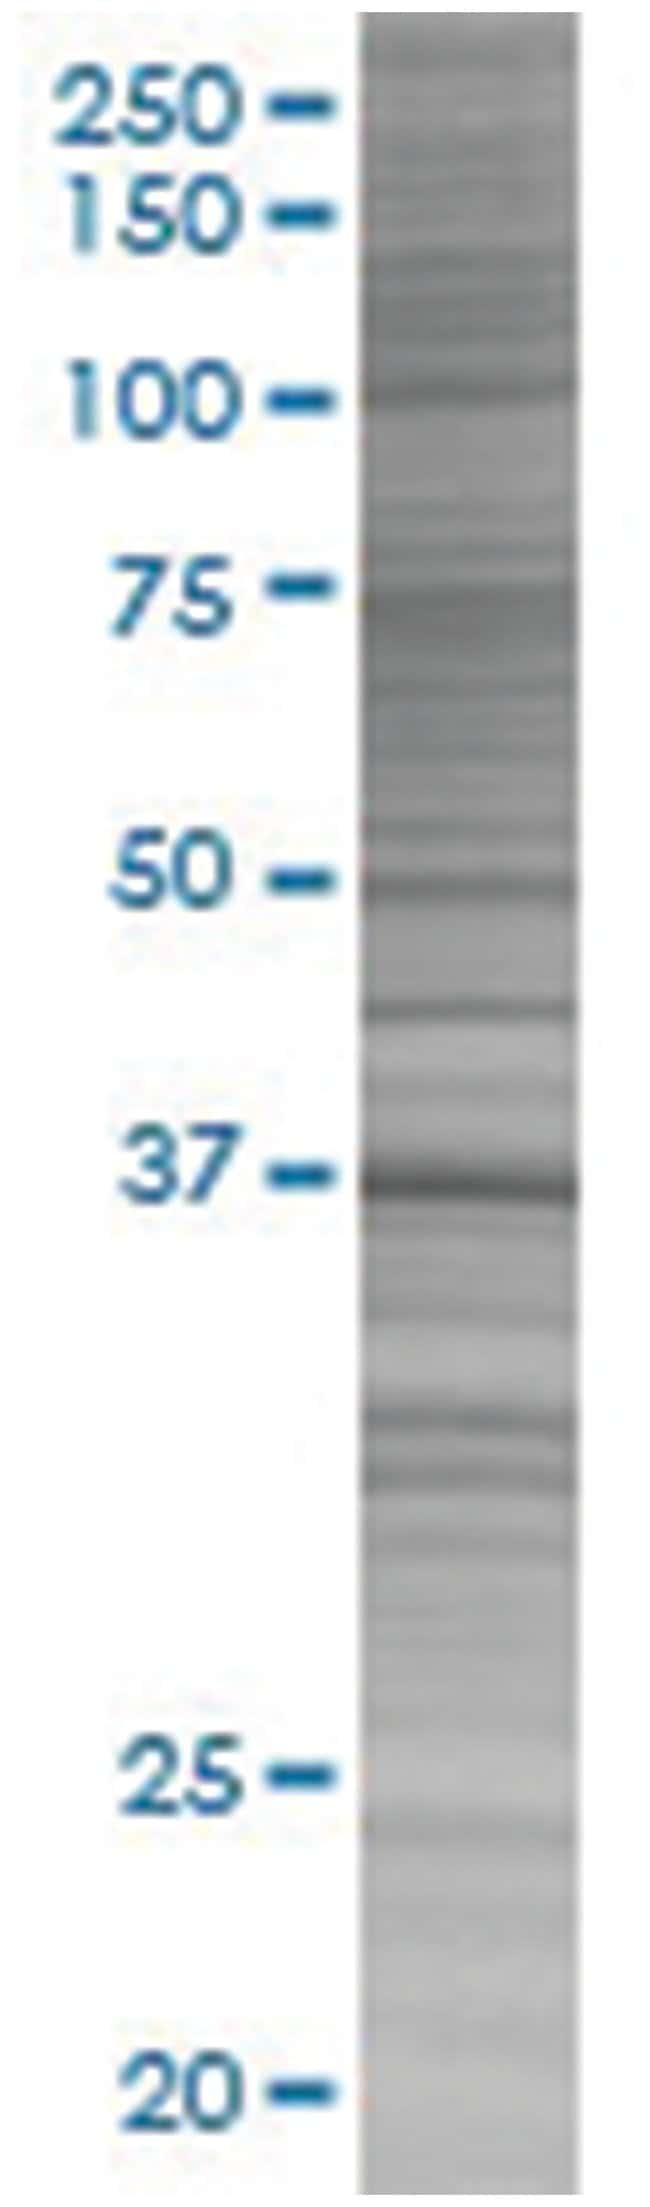 BOLL 293T Cell Overexpression Lysate (Denatured), Abnova 100µL:Life